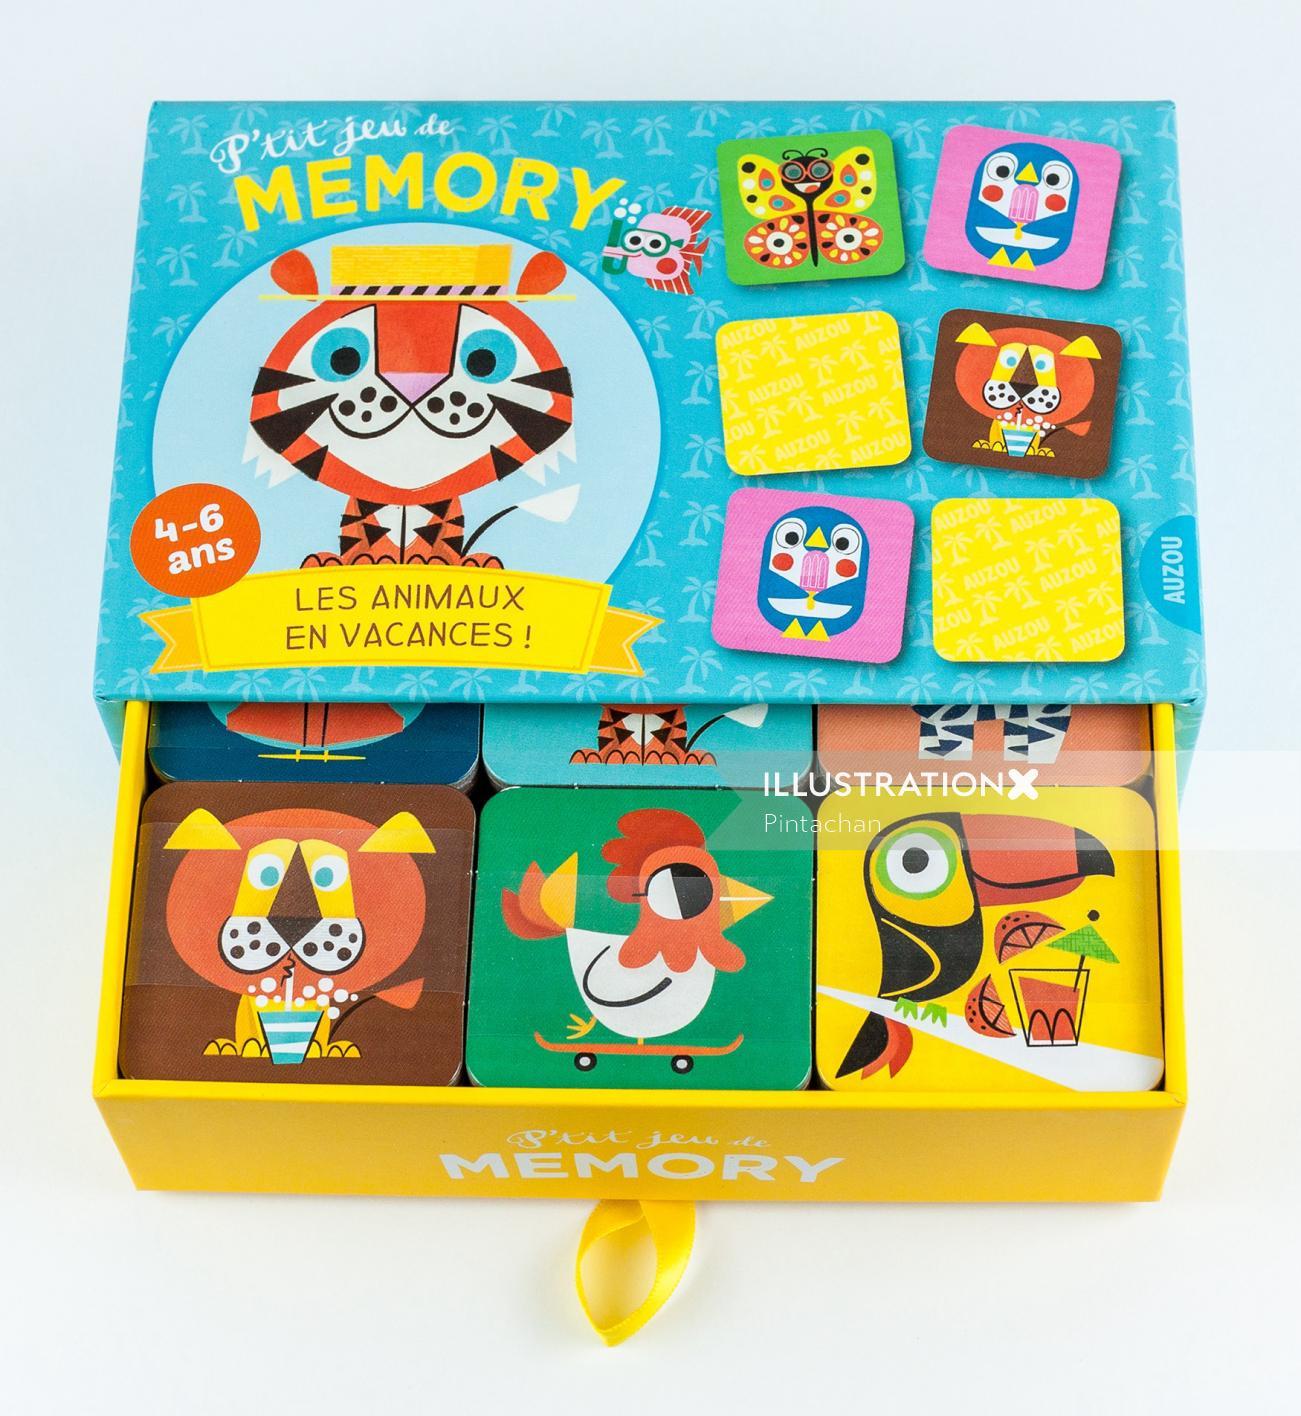 Illustration on gift box